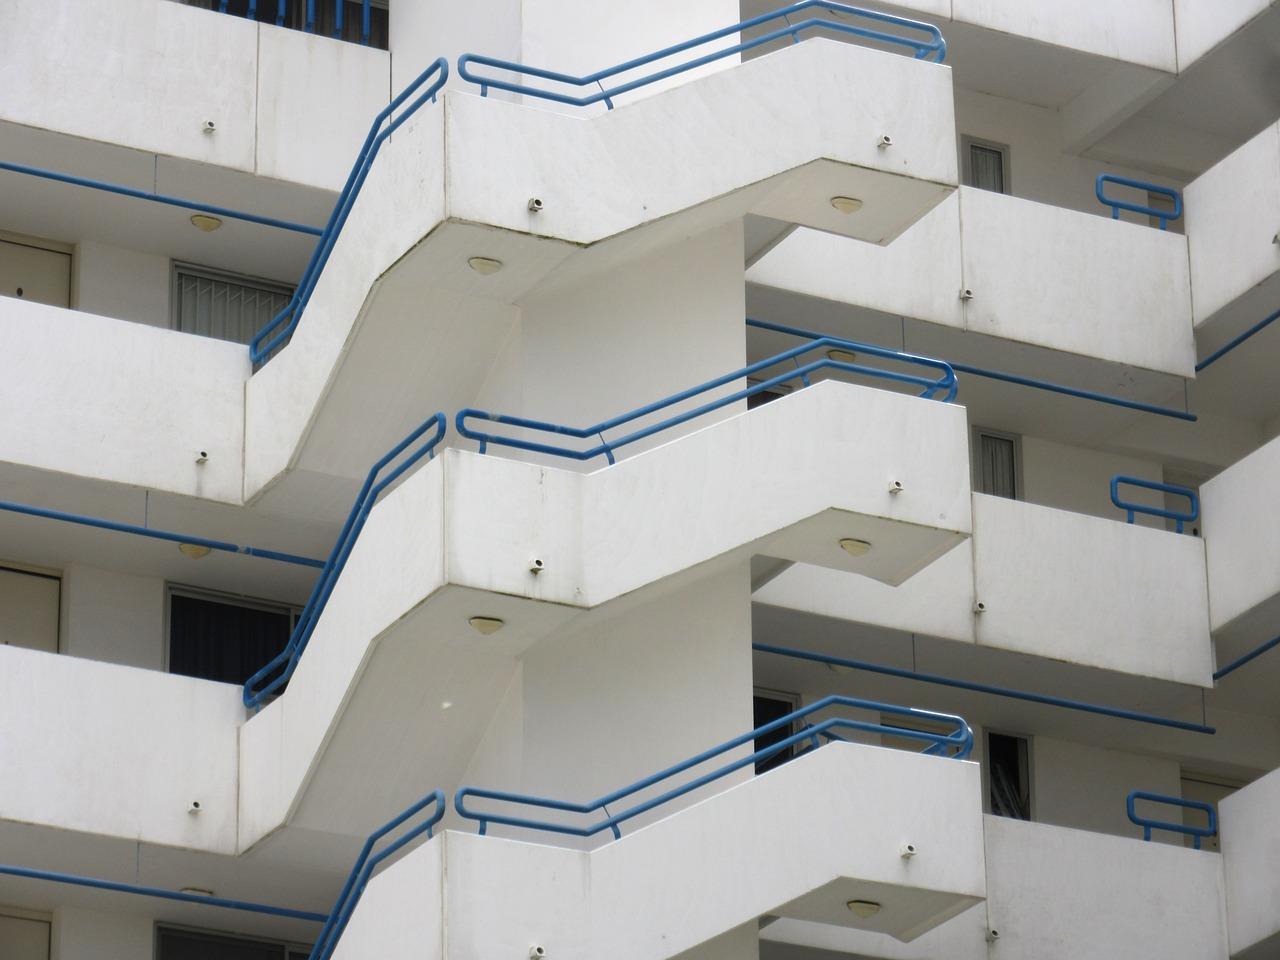 staircase-1154807_1280.jpg